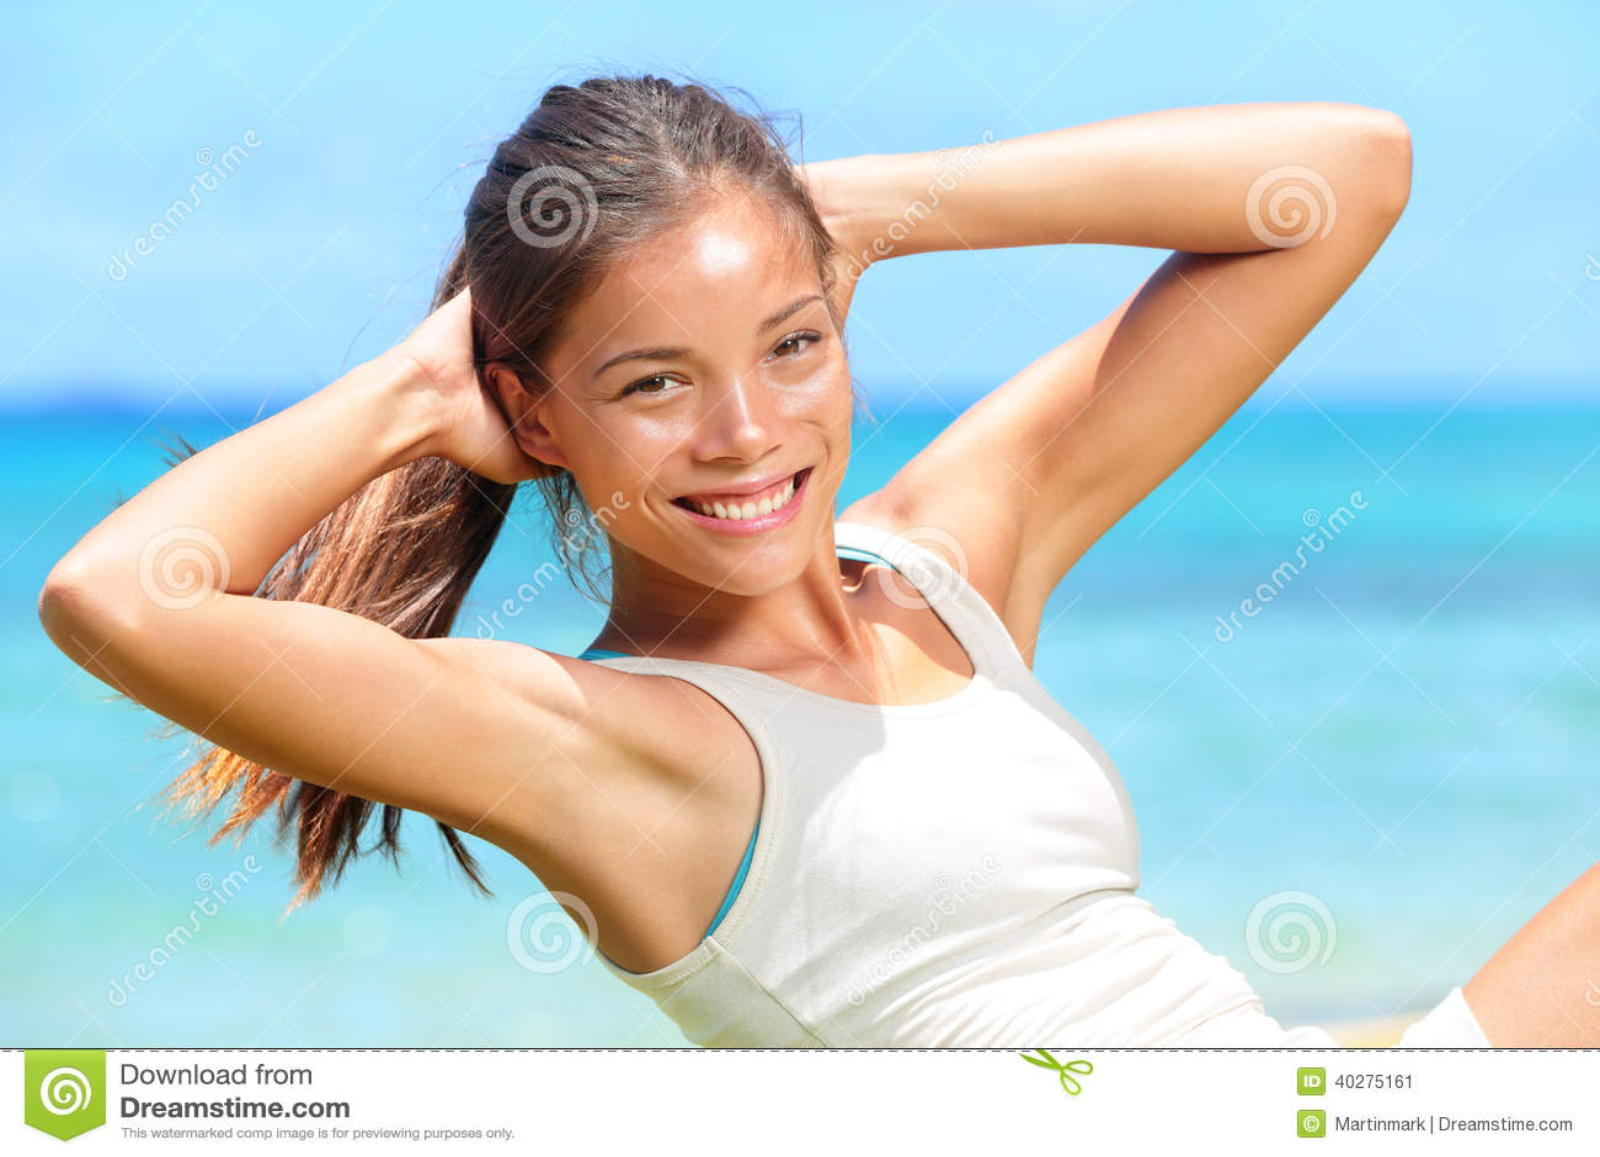 Exercising Fitness Woman Doing Sit Ups Outside Stock Photo Image 40275161